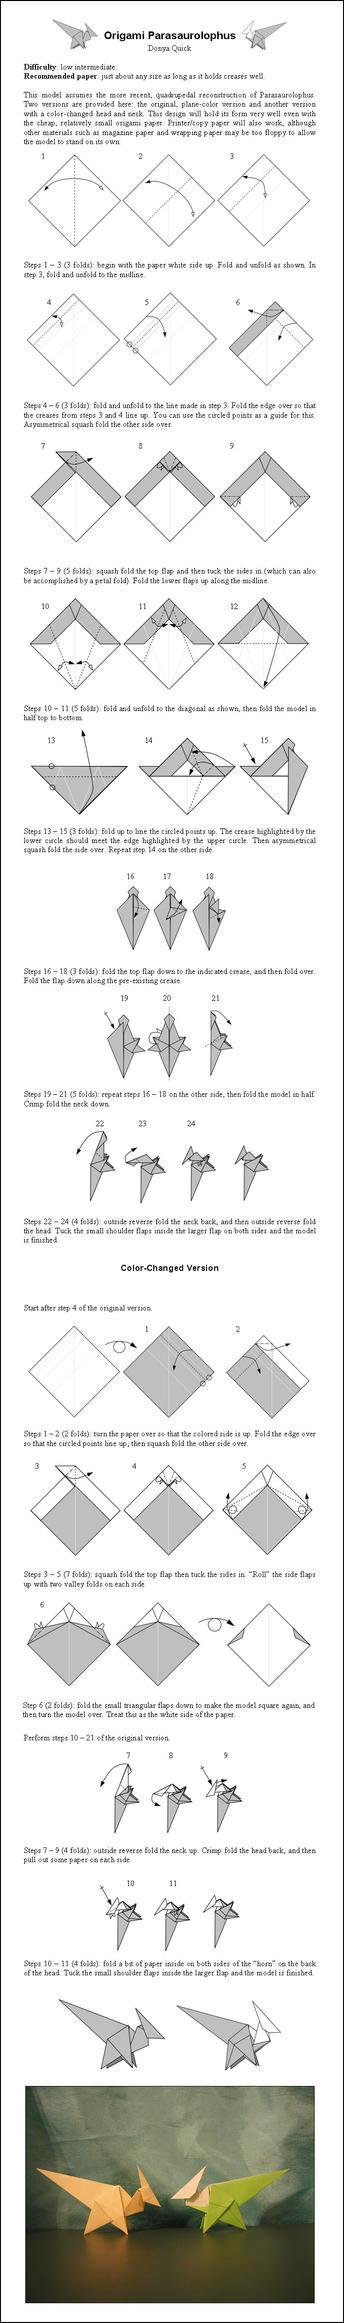 Origami Parasaurolophus Instr. by DonyaQuick